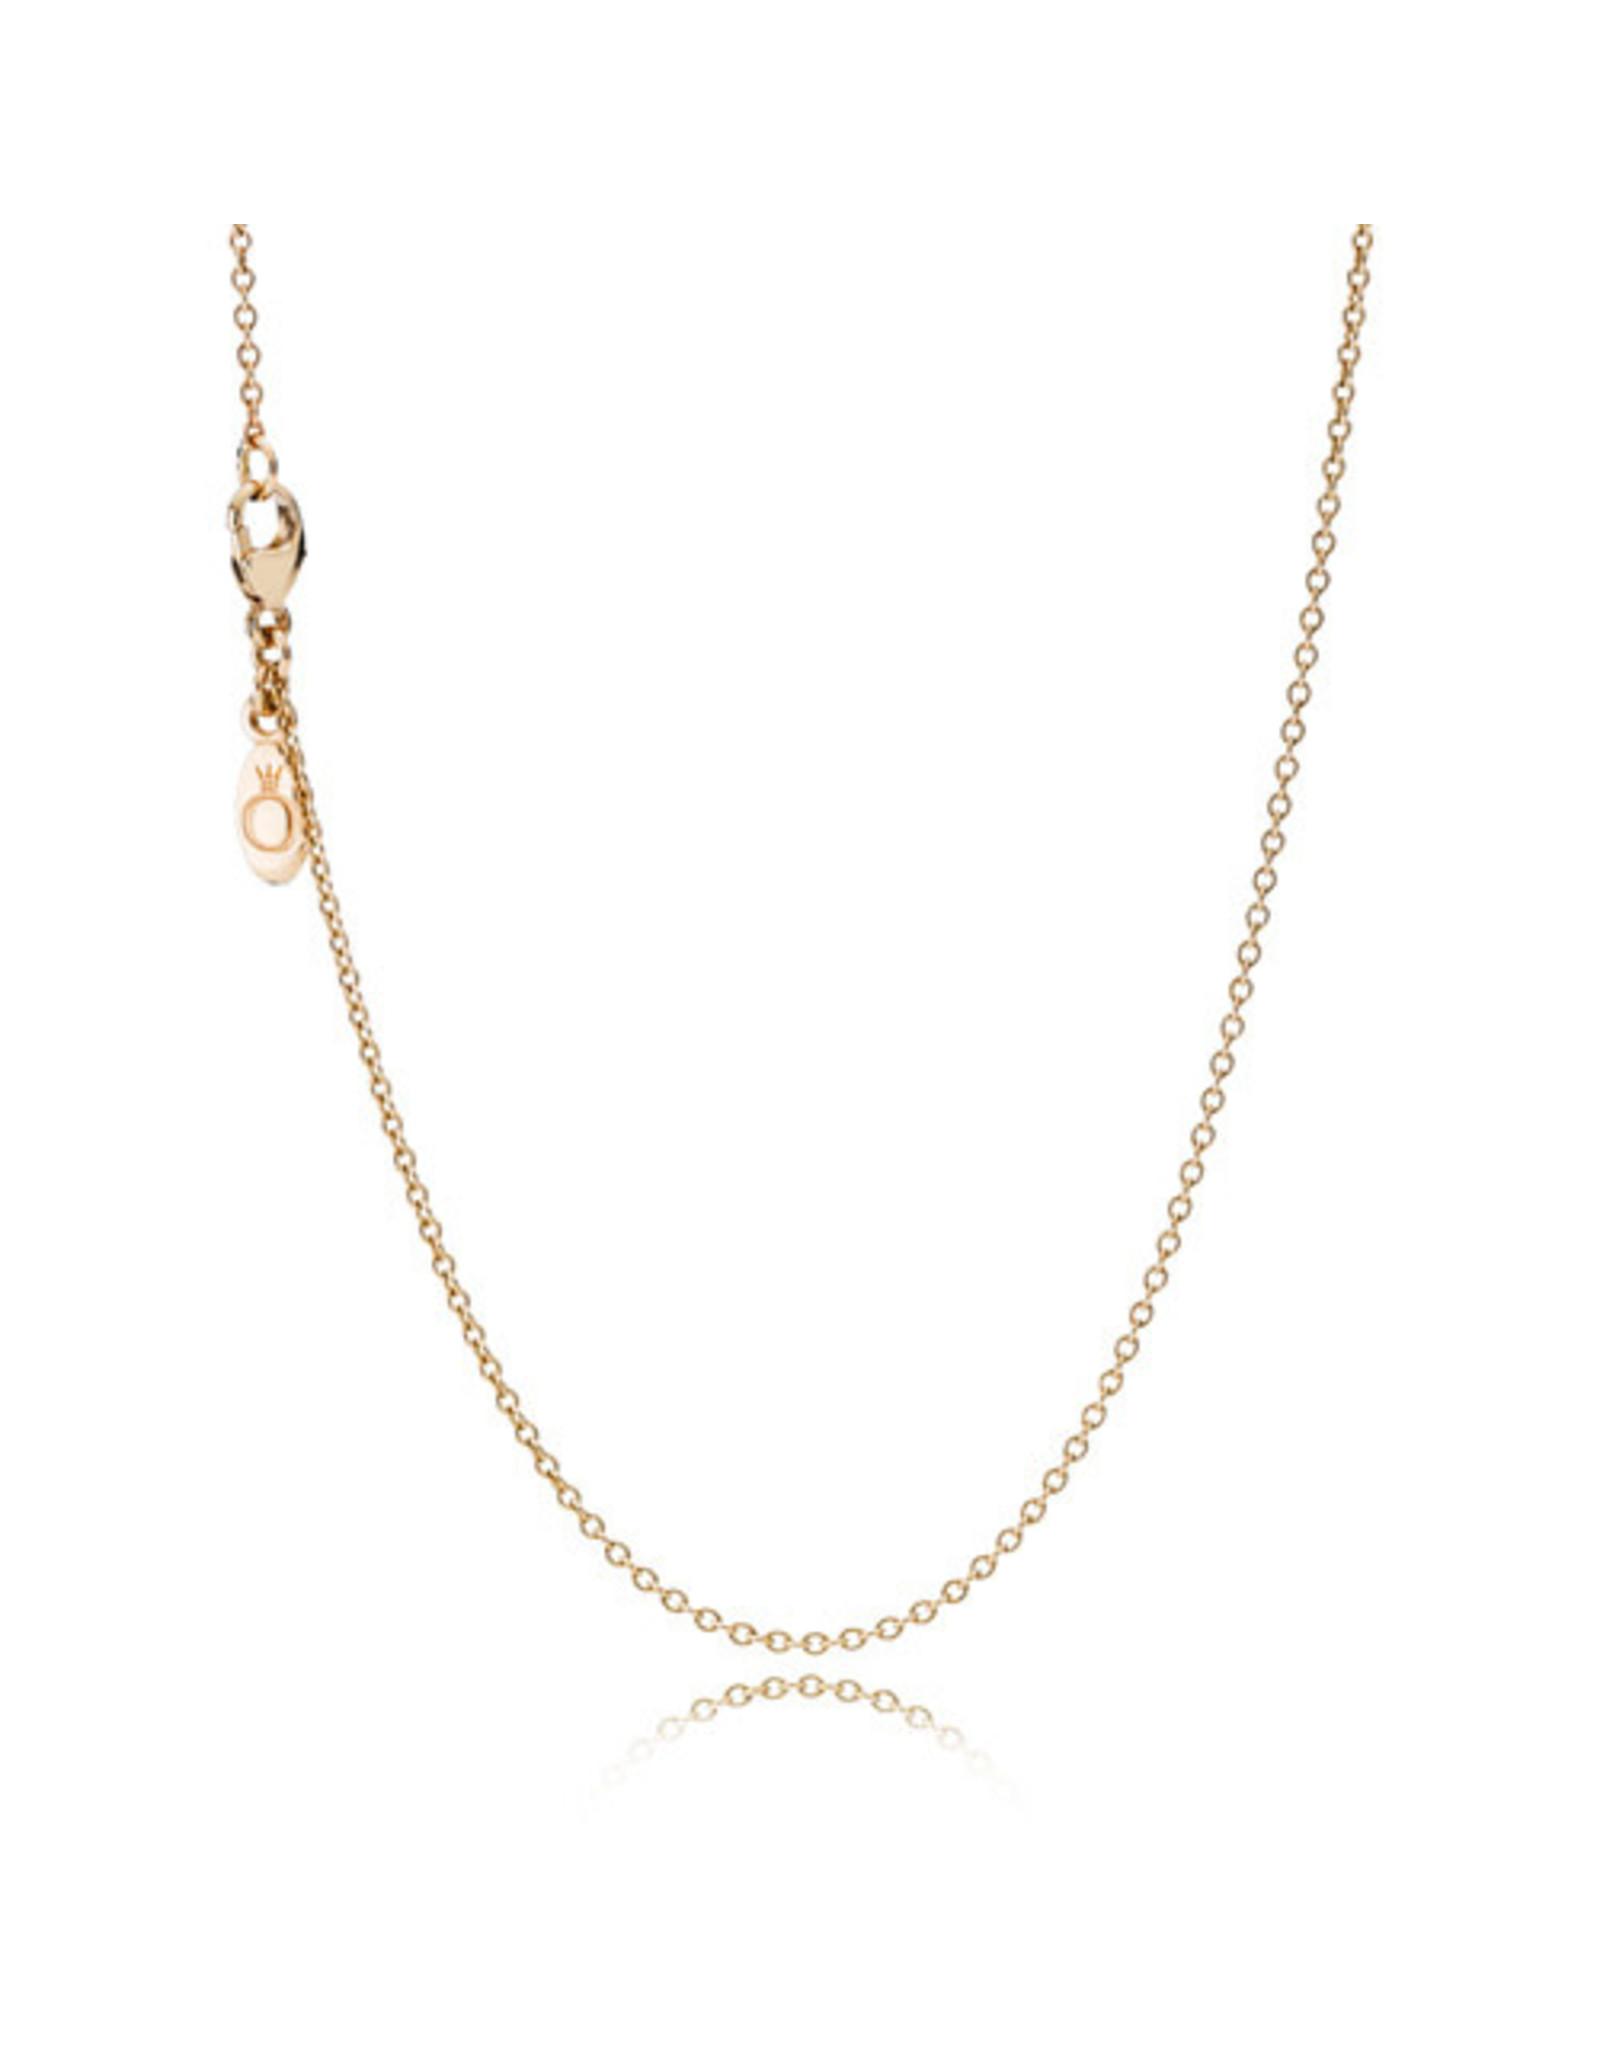 Pandora Pandora Delicate Gold Chain, 45 cm